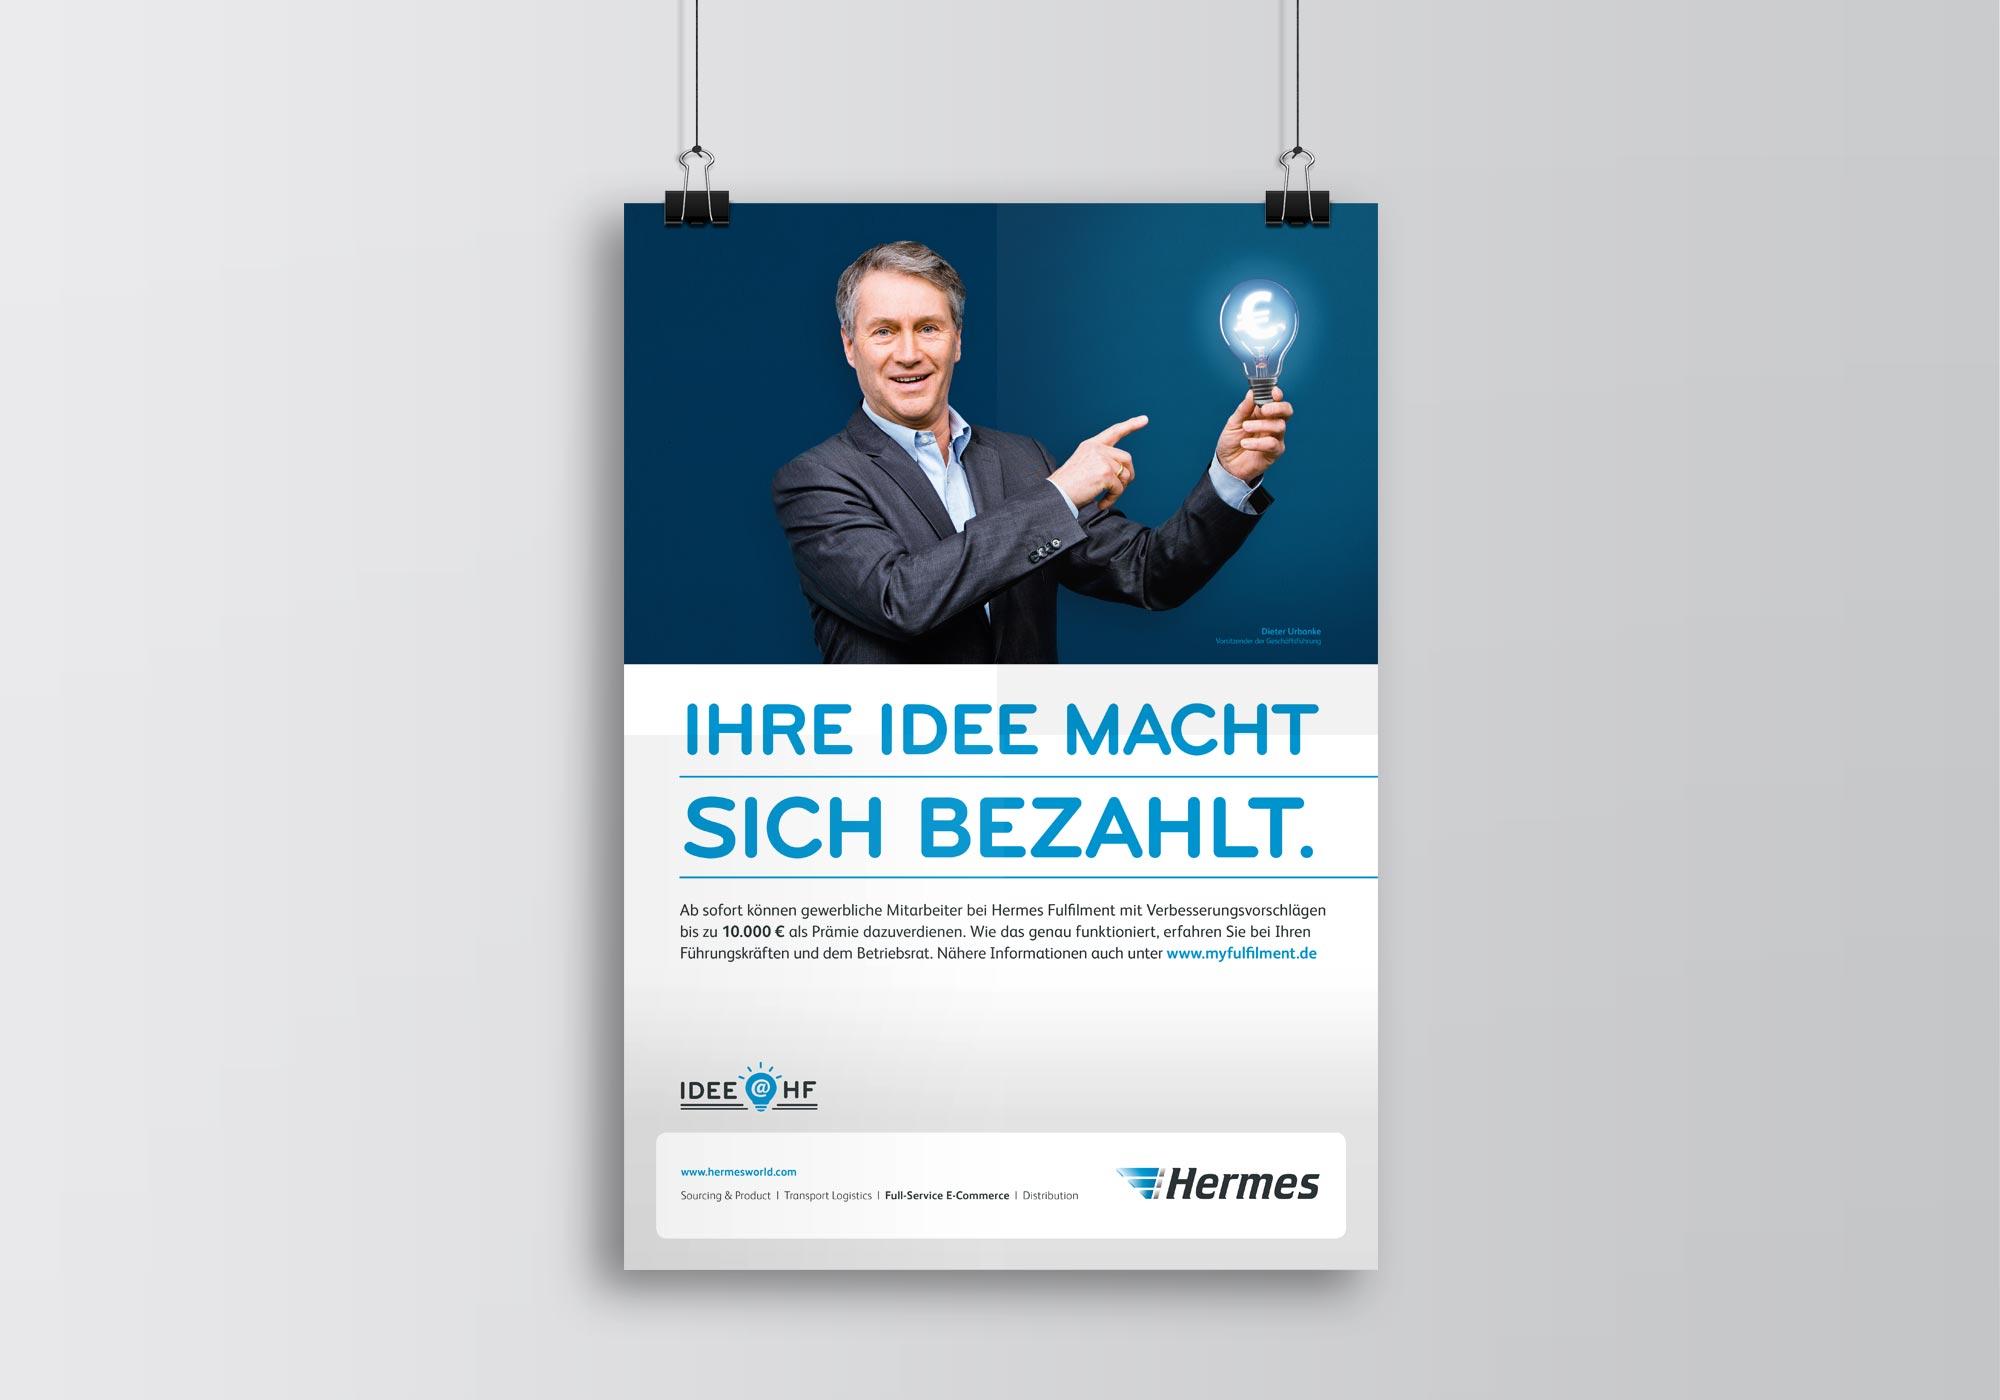 003_Idee@HF_Poster